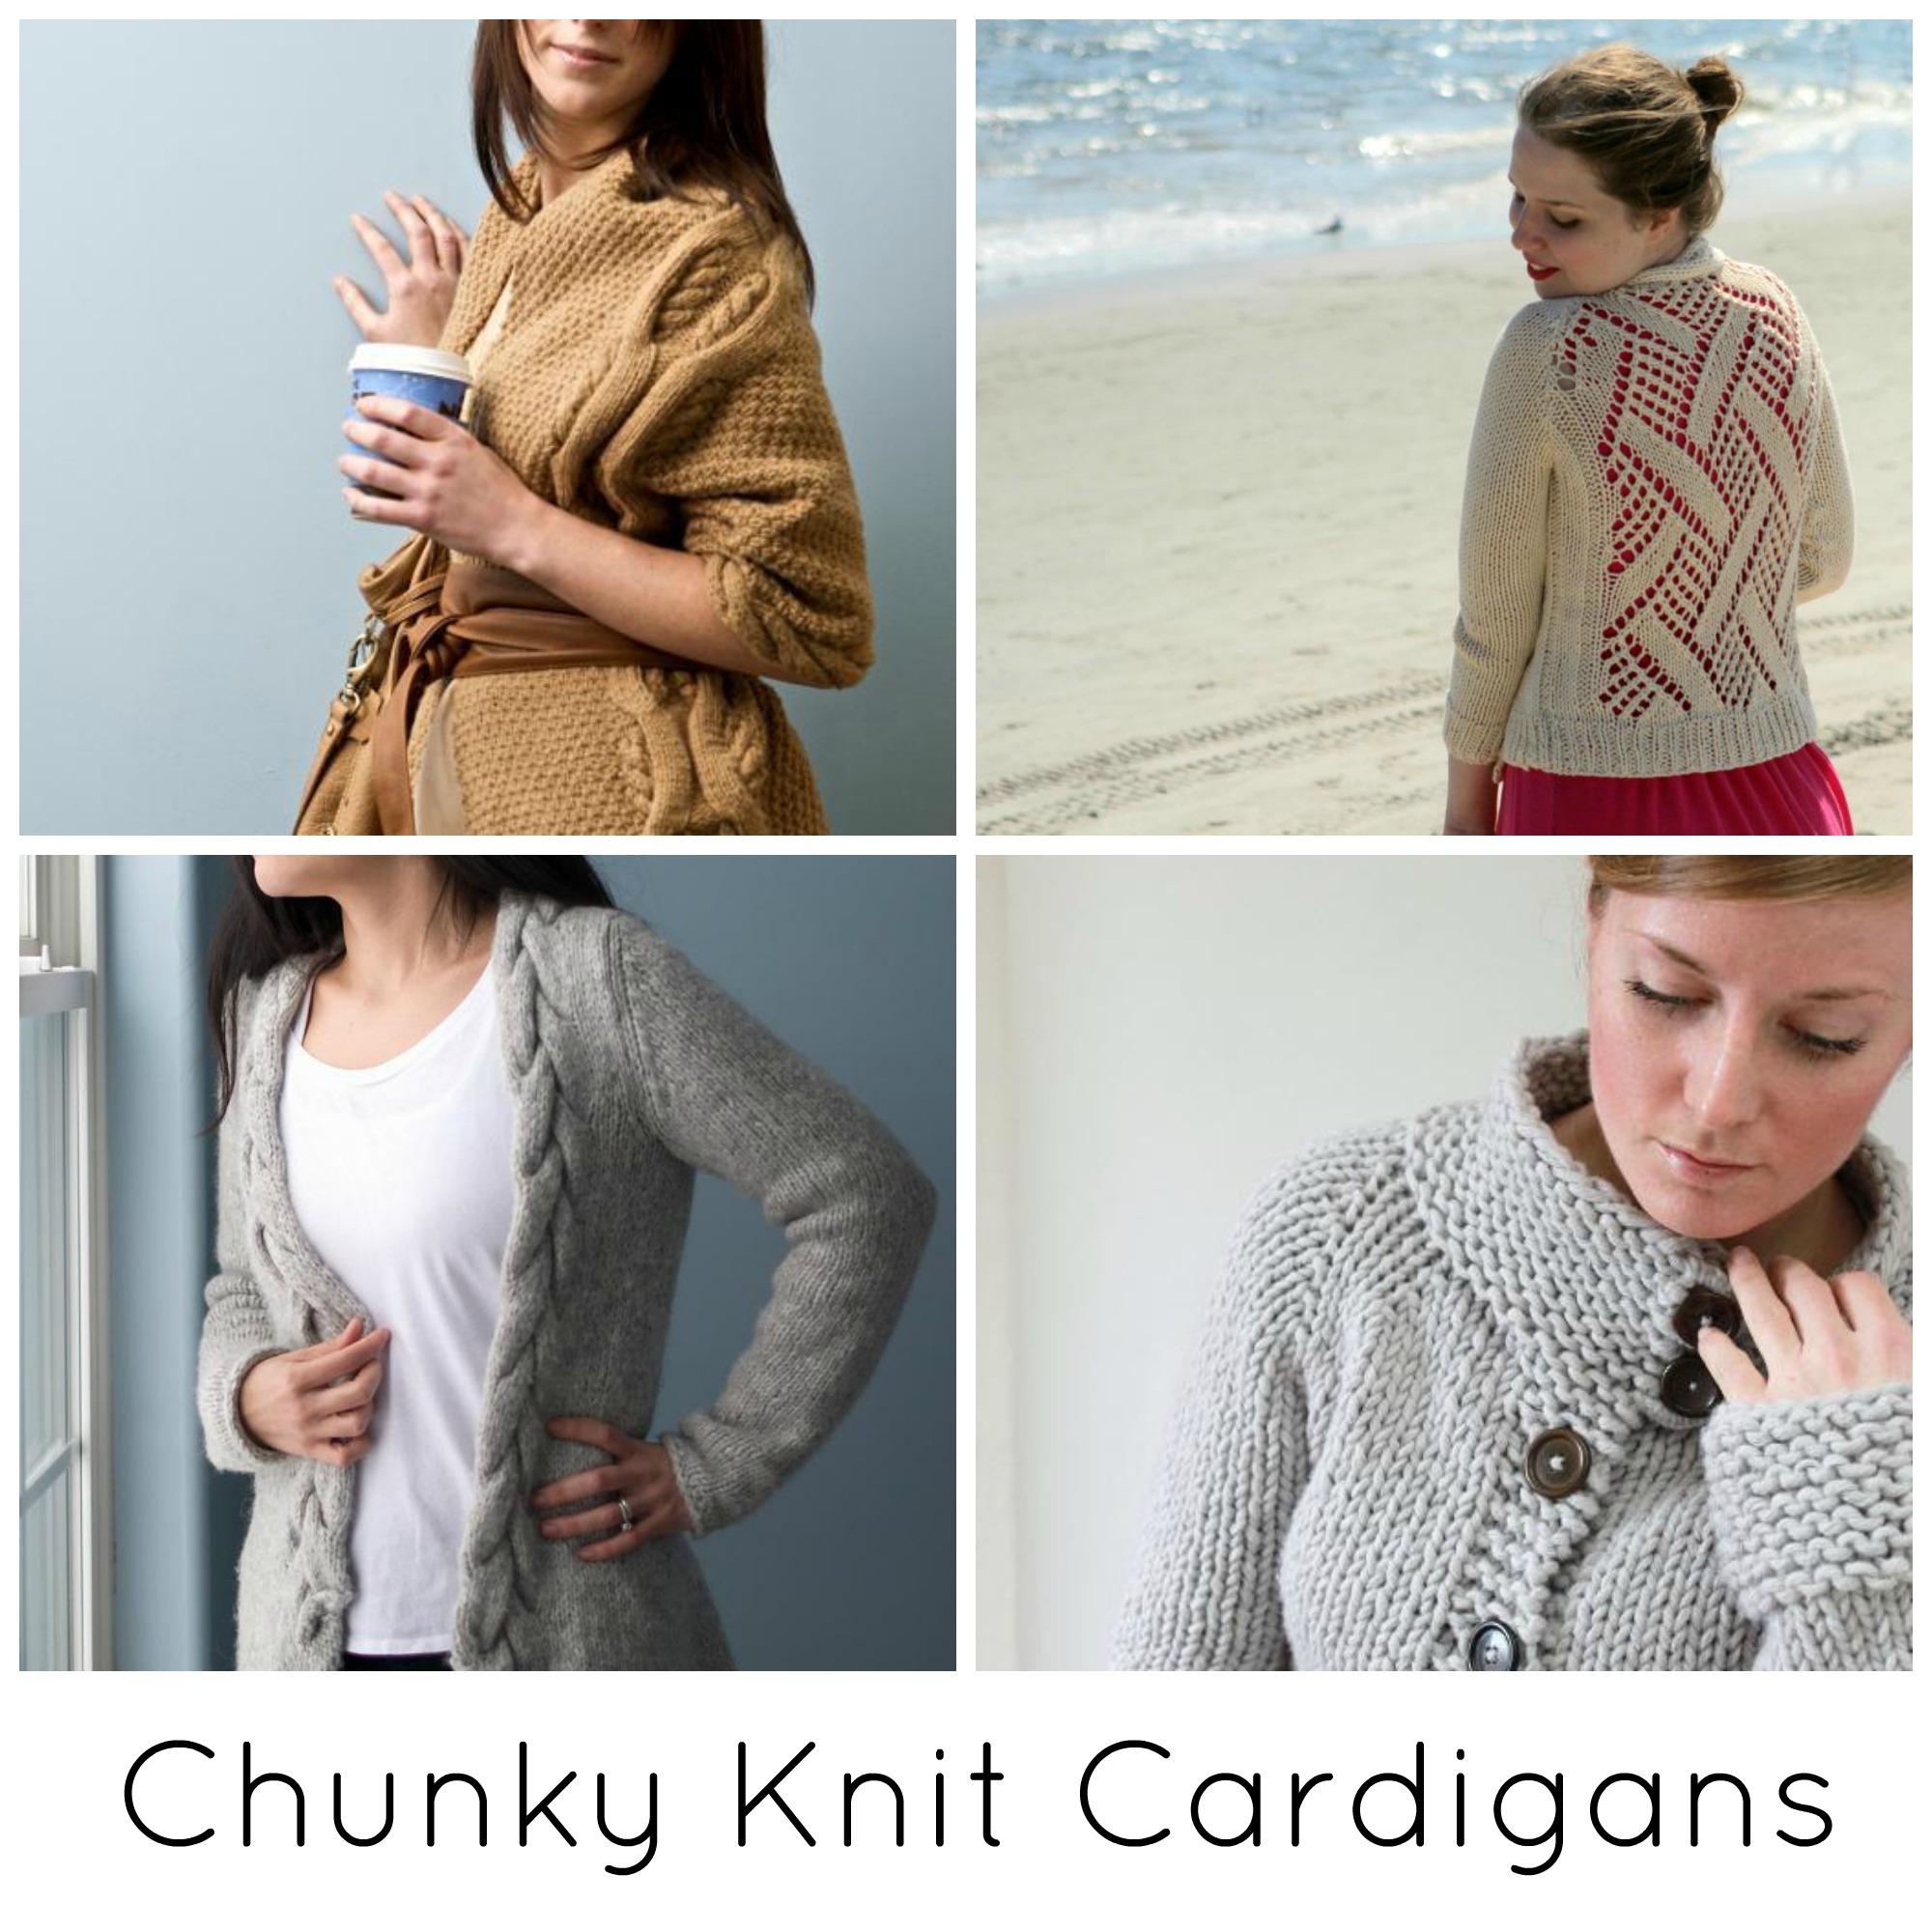 Chunky Knit Cardigan Patterns